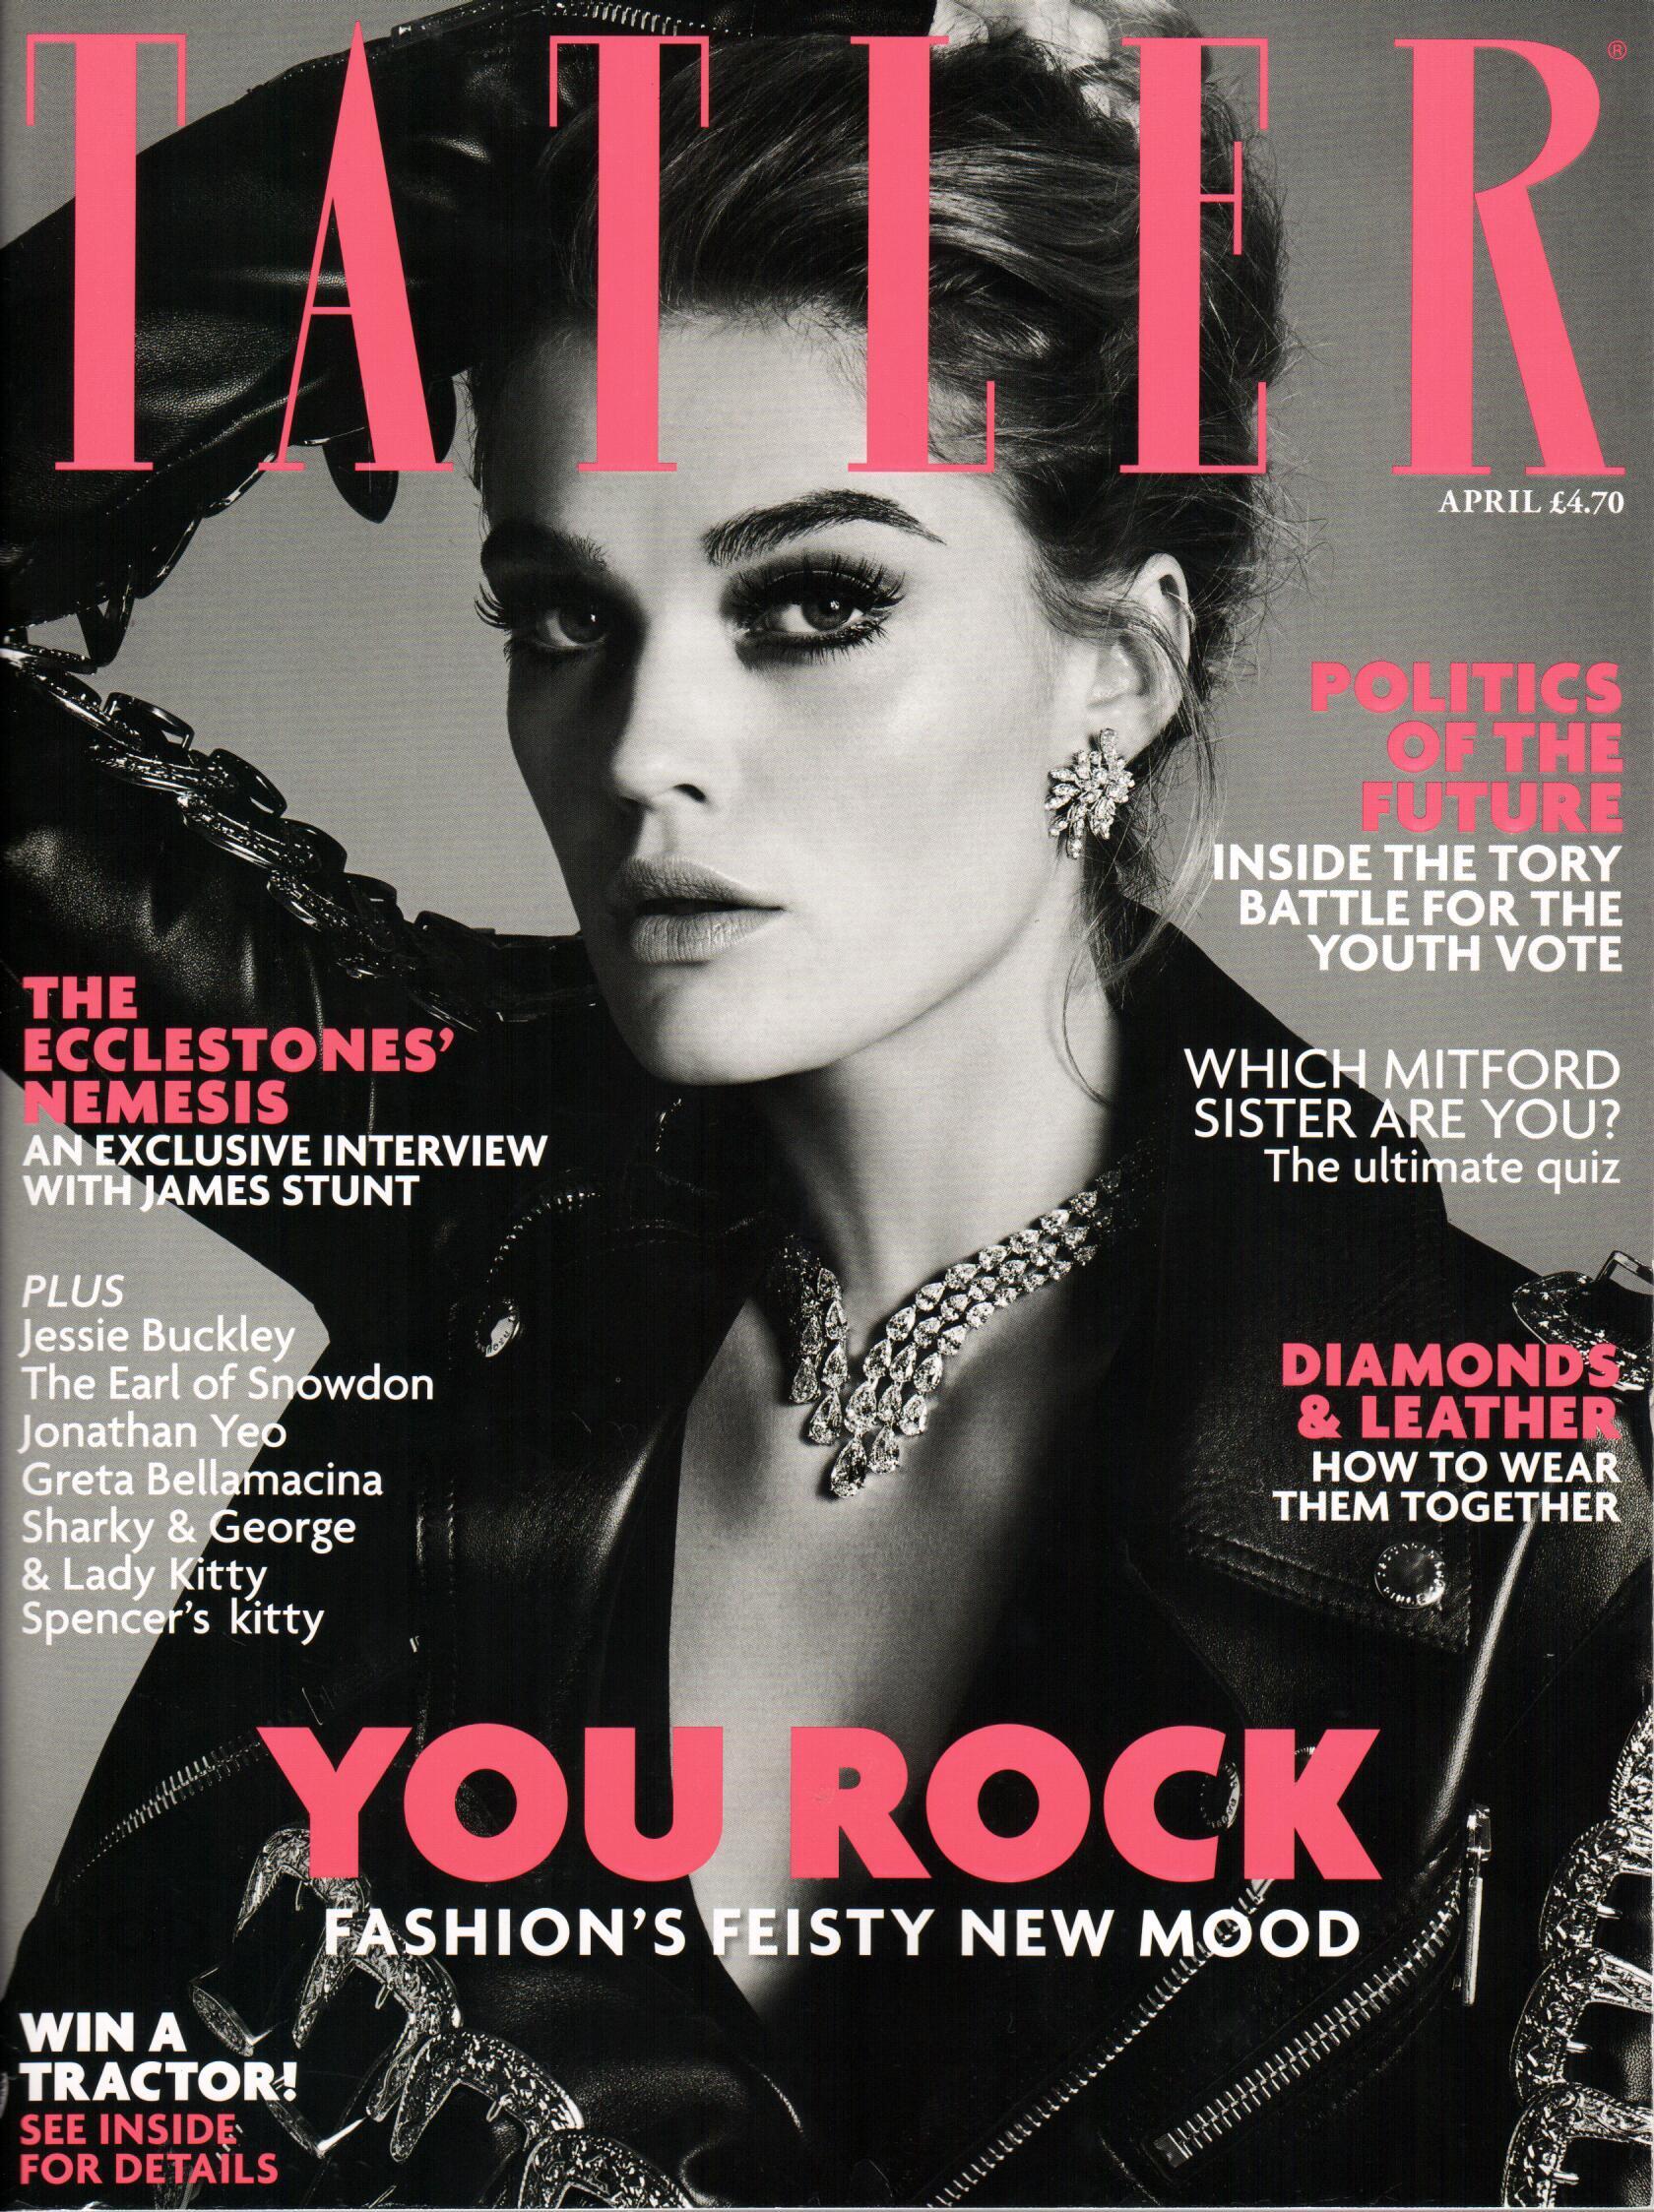 Tatler April 2018 cover.jpg